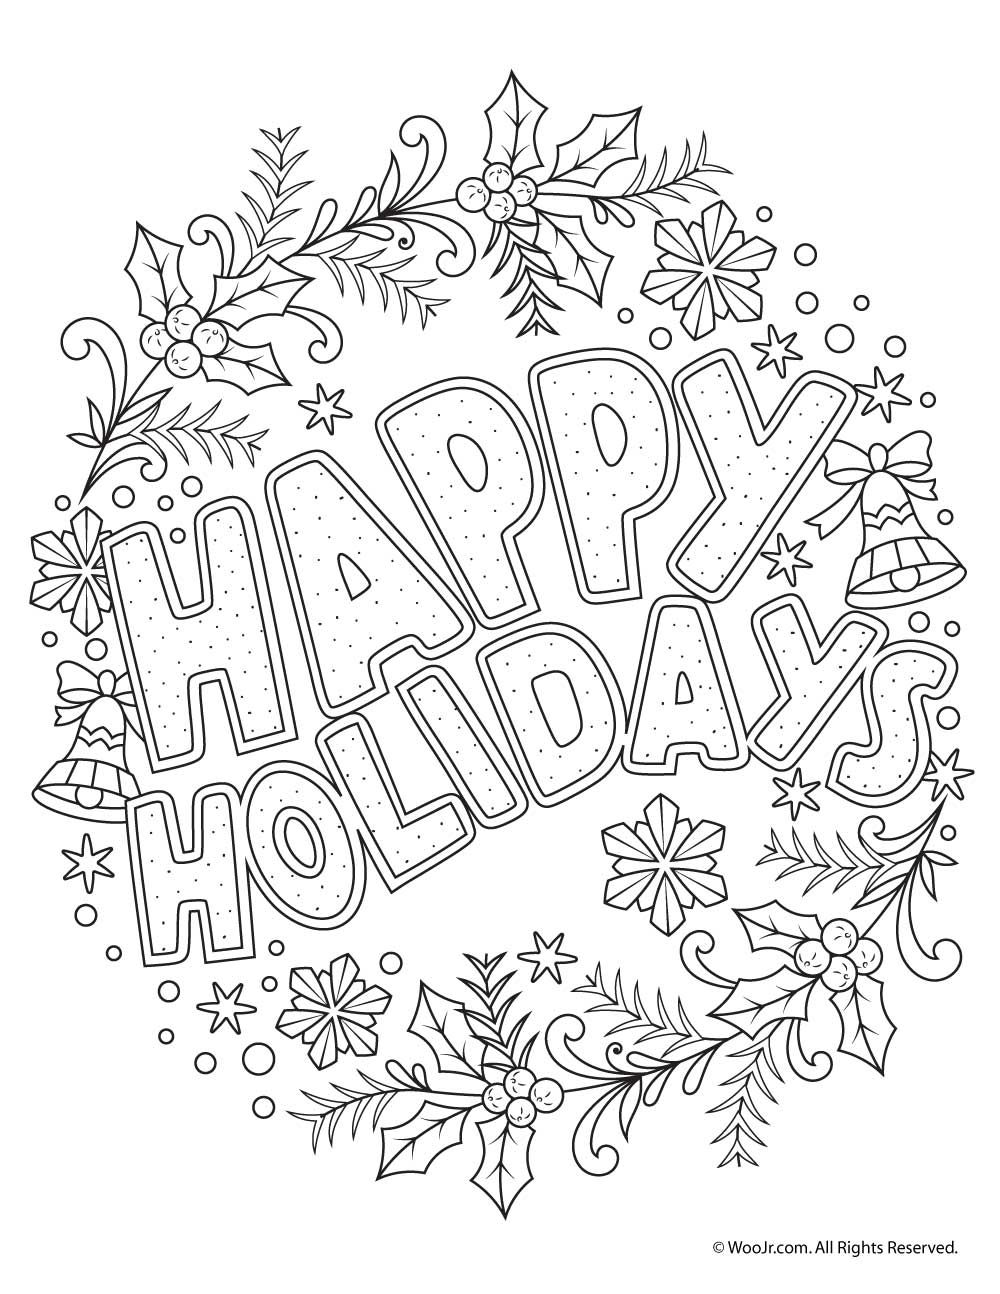 Beautiful Printable Christmas Adult Coloring Pages ... | christmas colouring pages for adults